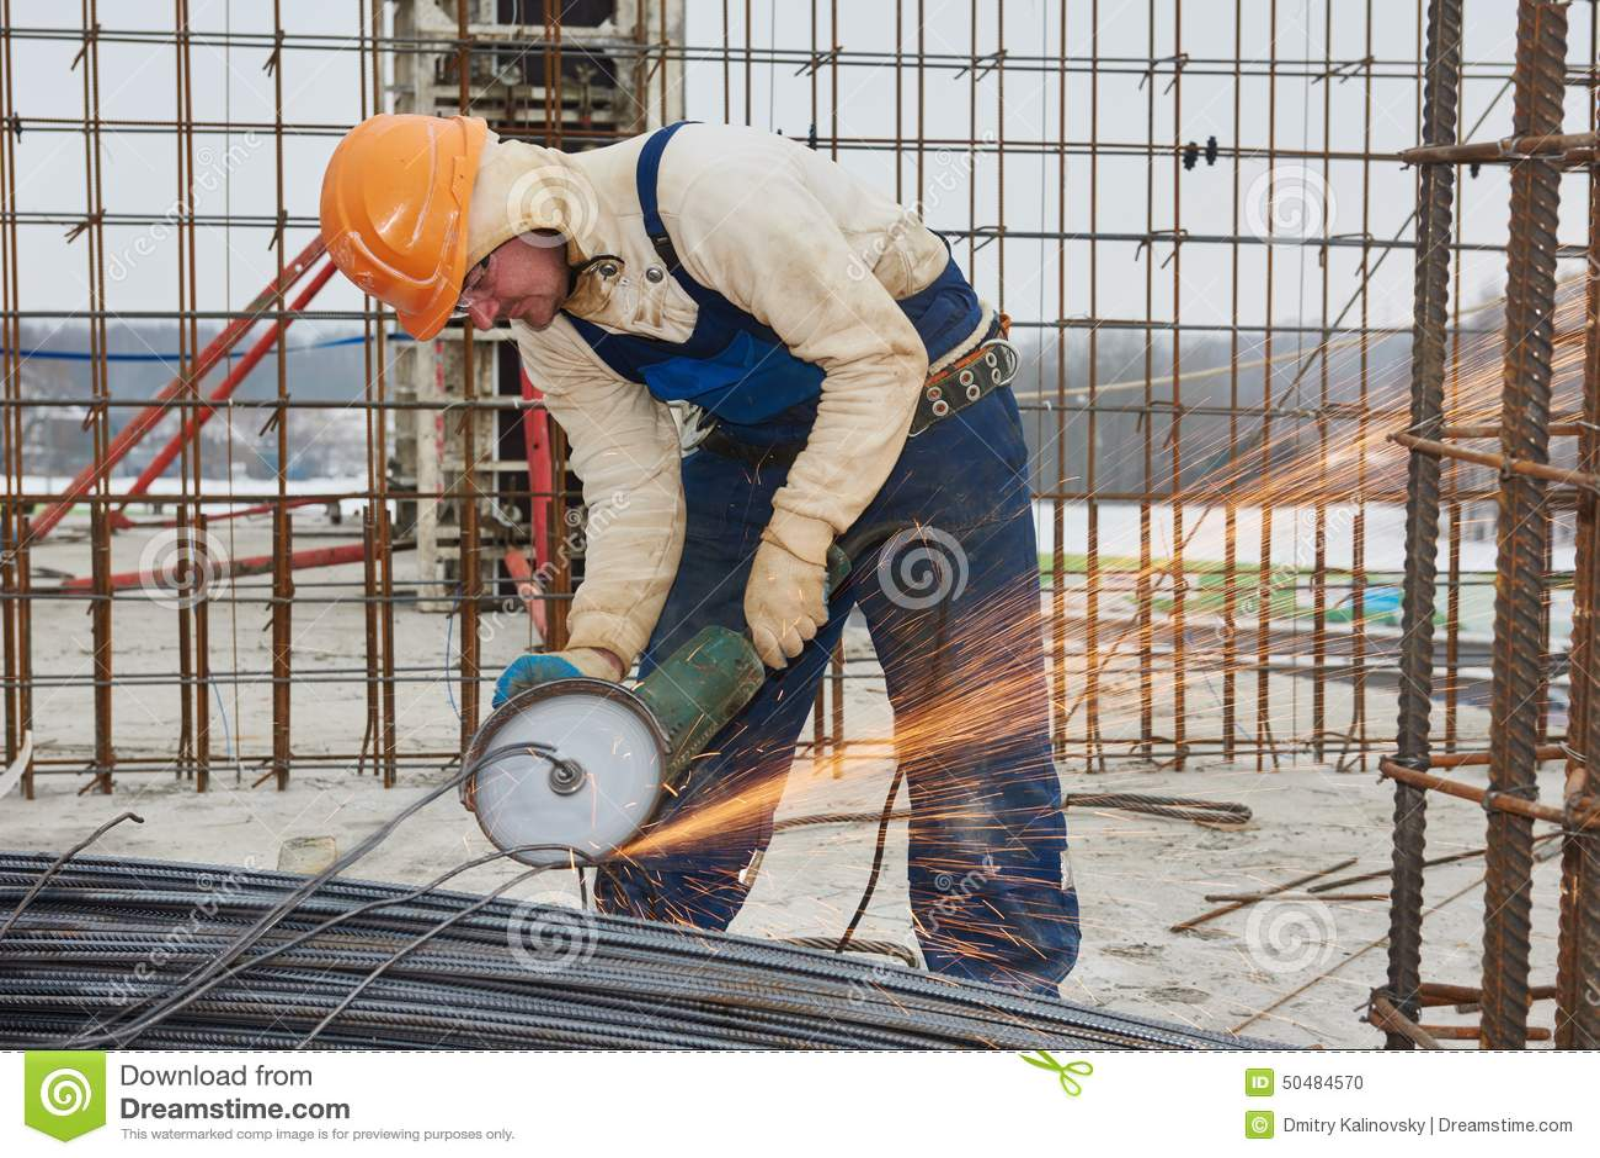 worker cutting rebar by grinding machine